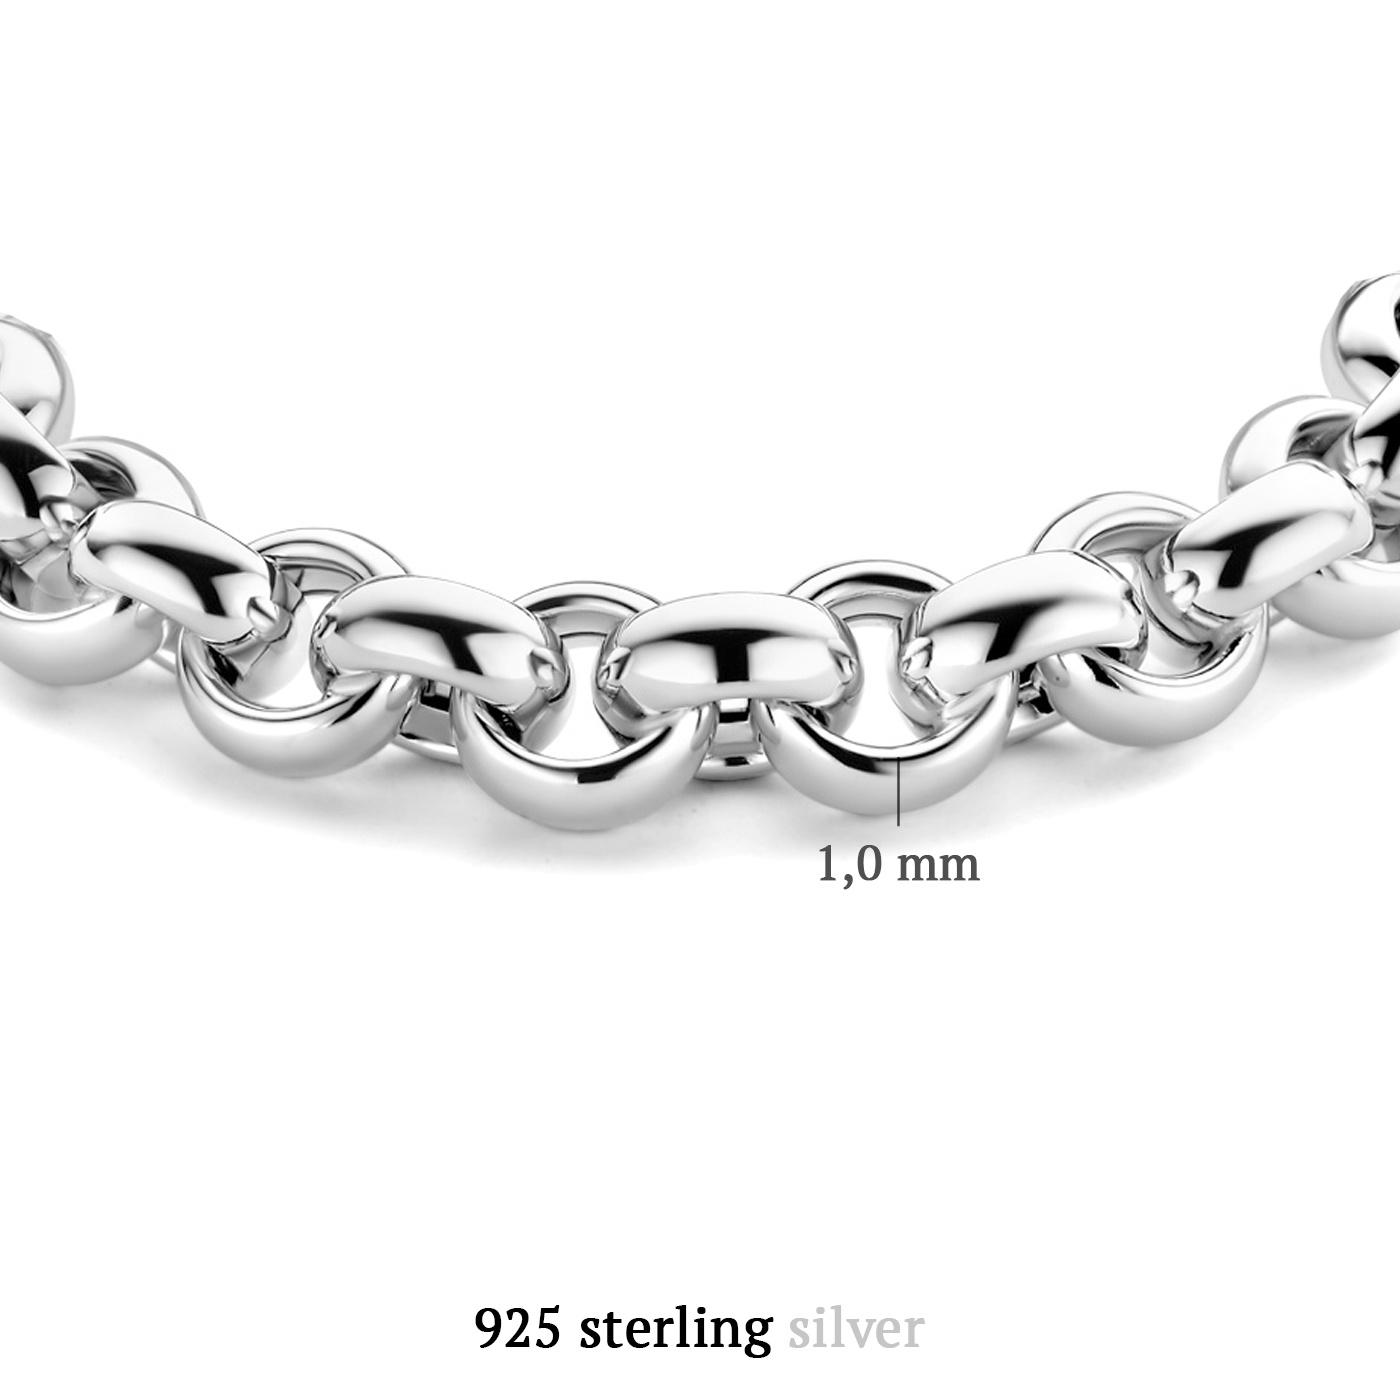 Parte di Me Bibbiena Poppi San Fedele 925 sterling zilveren armband